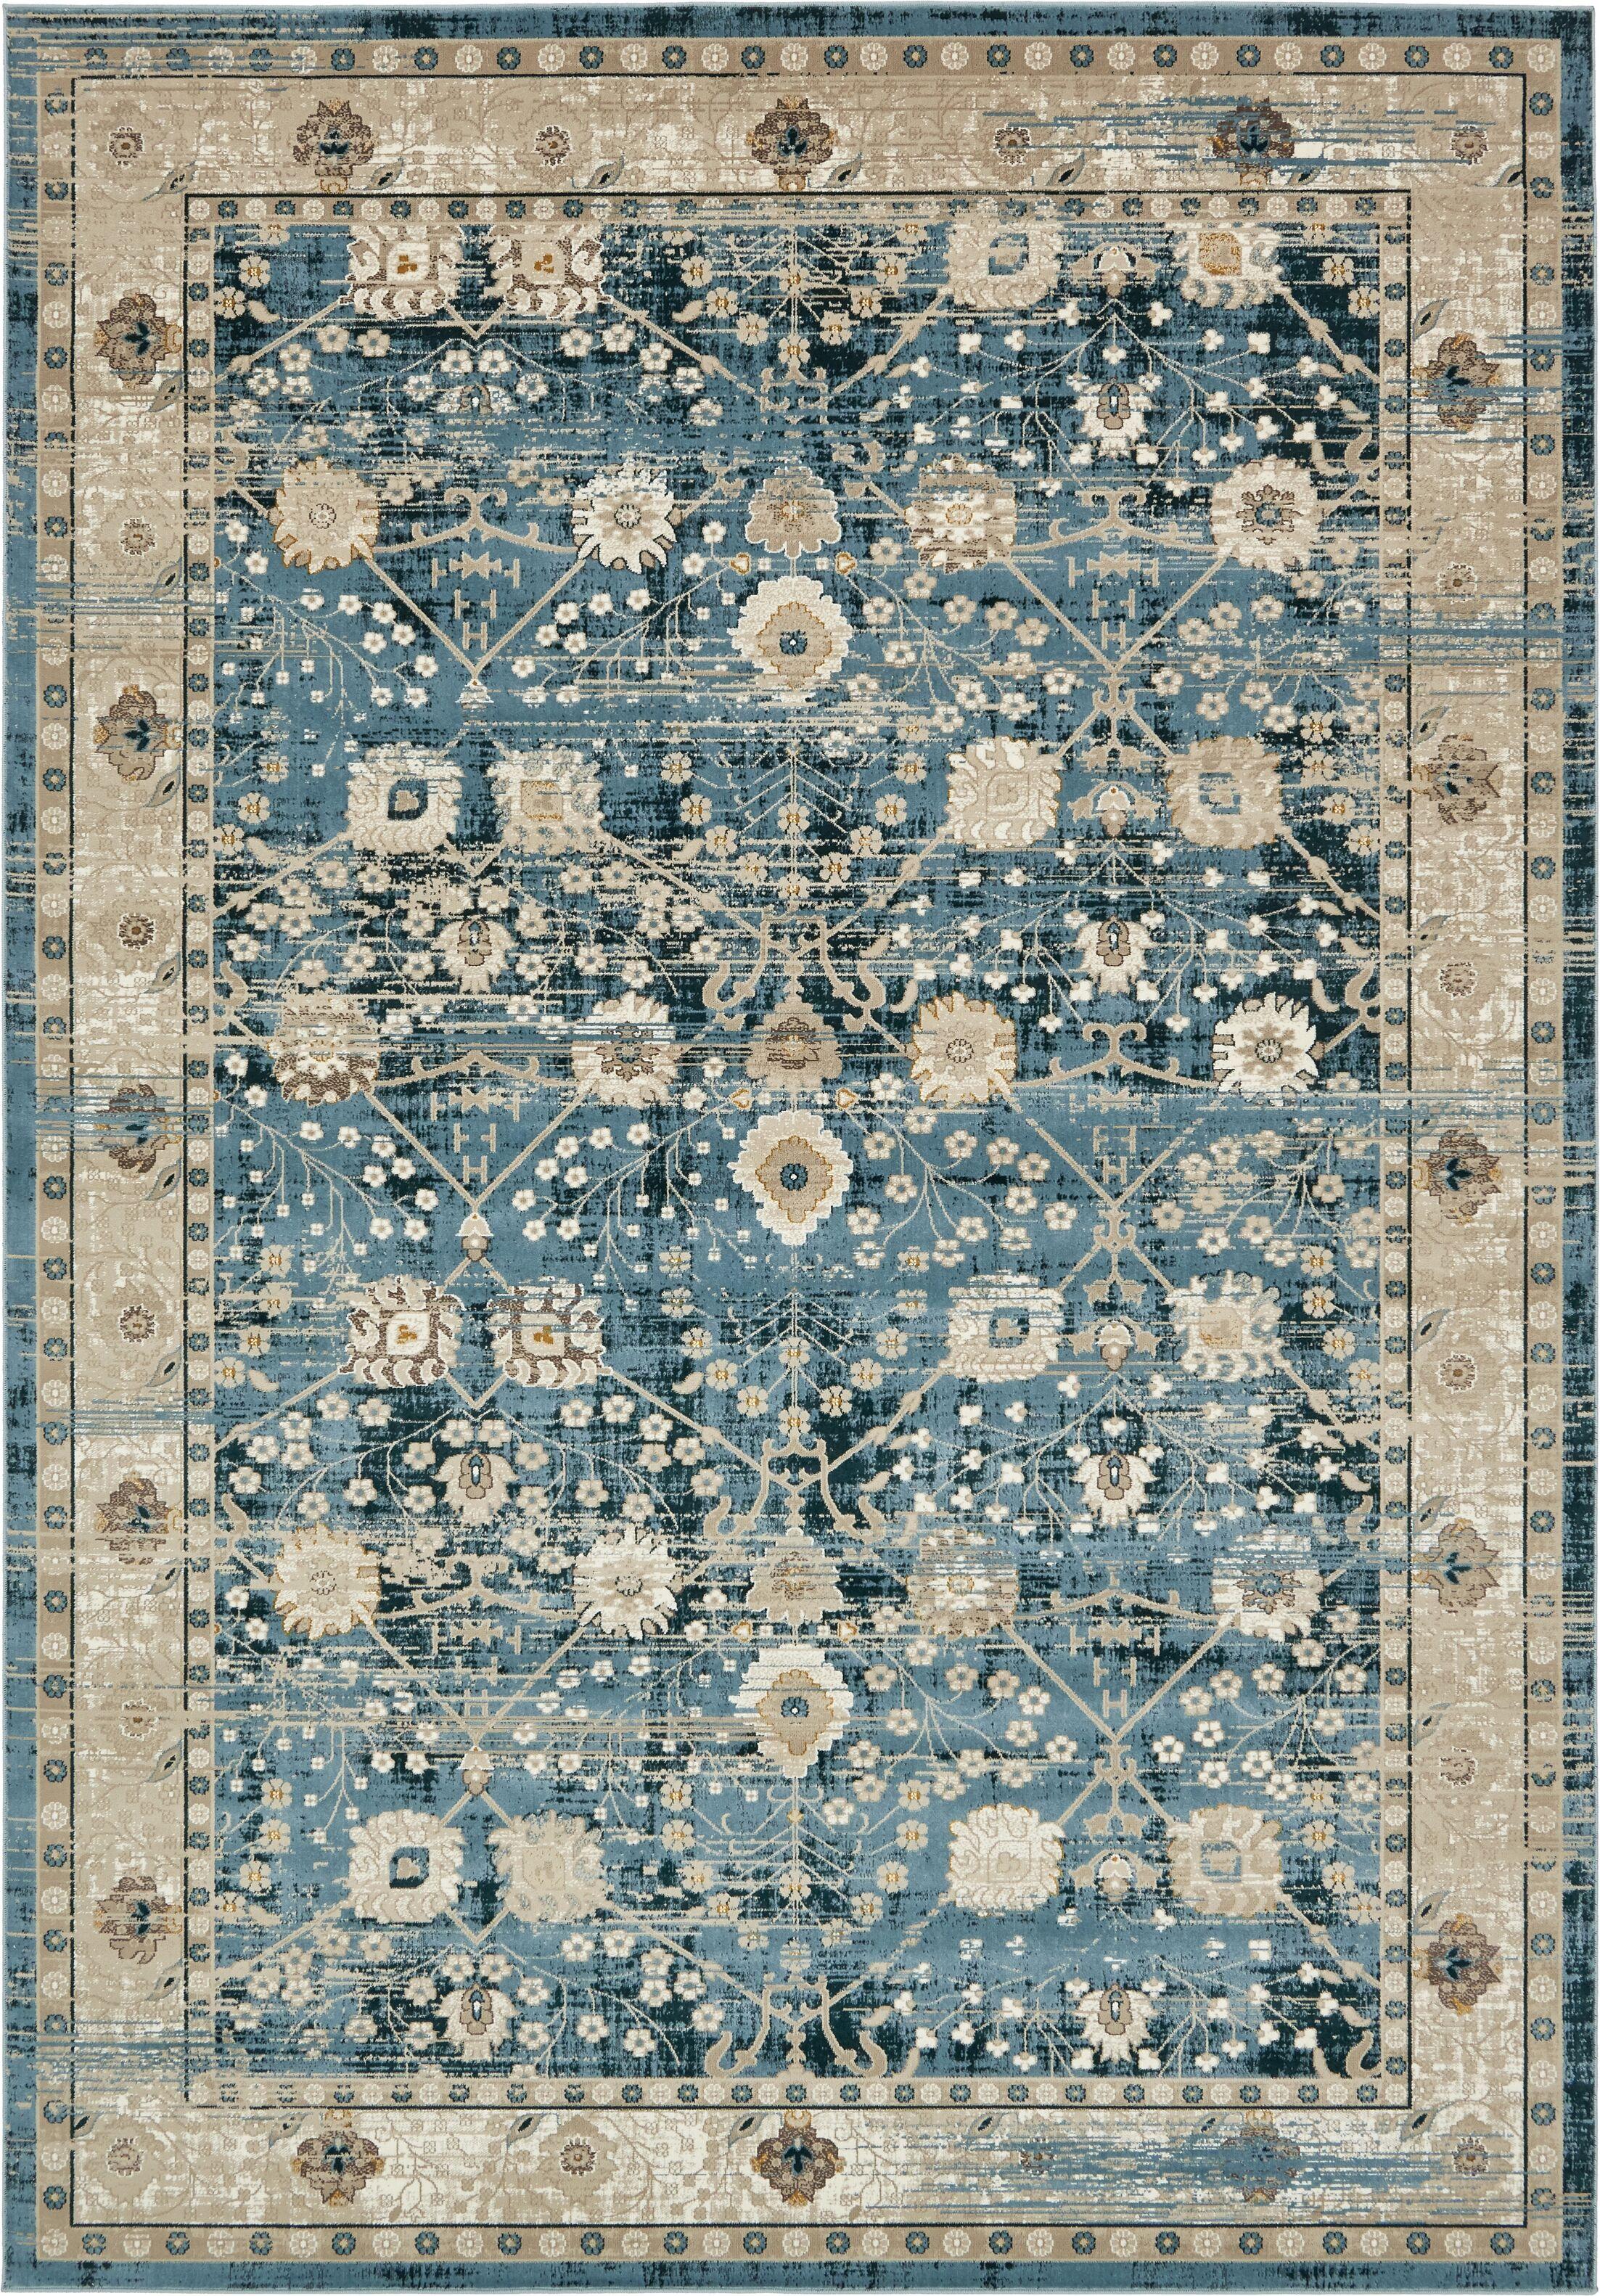 Hurst Dark Blue Area Rug Rug Size: Rectangle 8' x 11'2